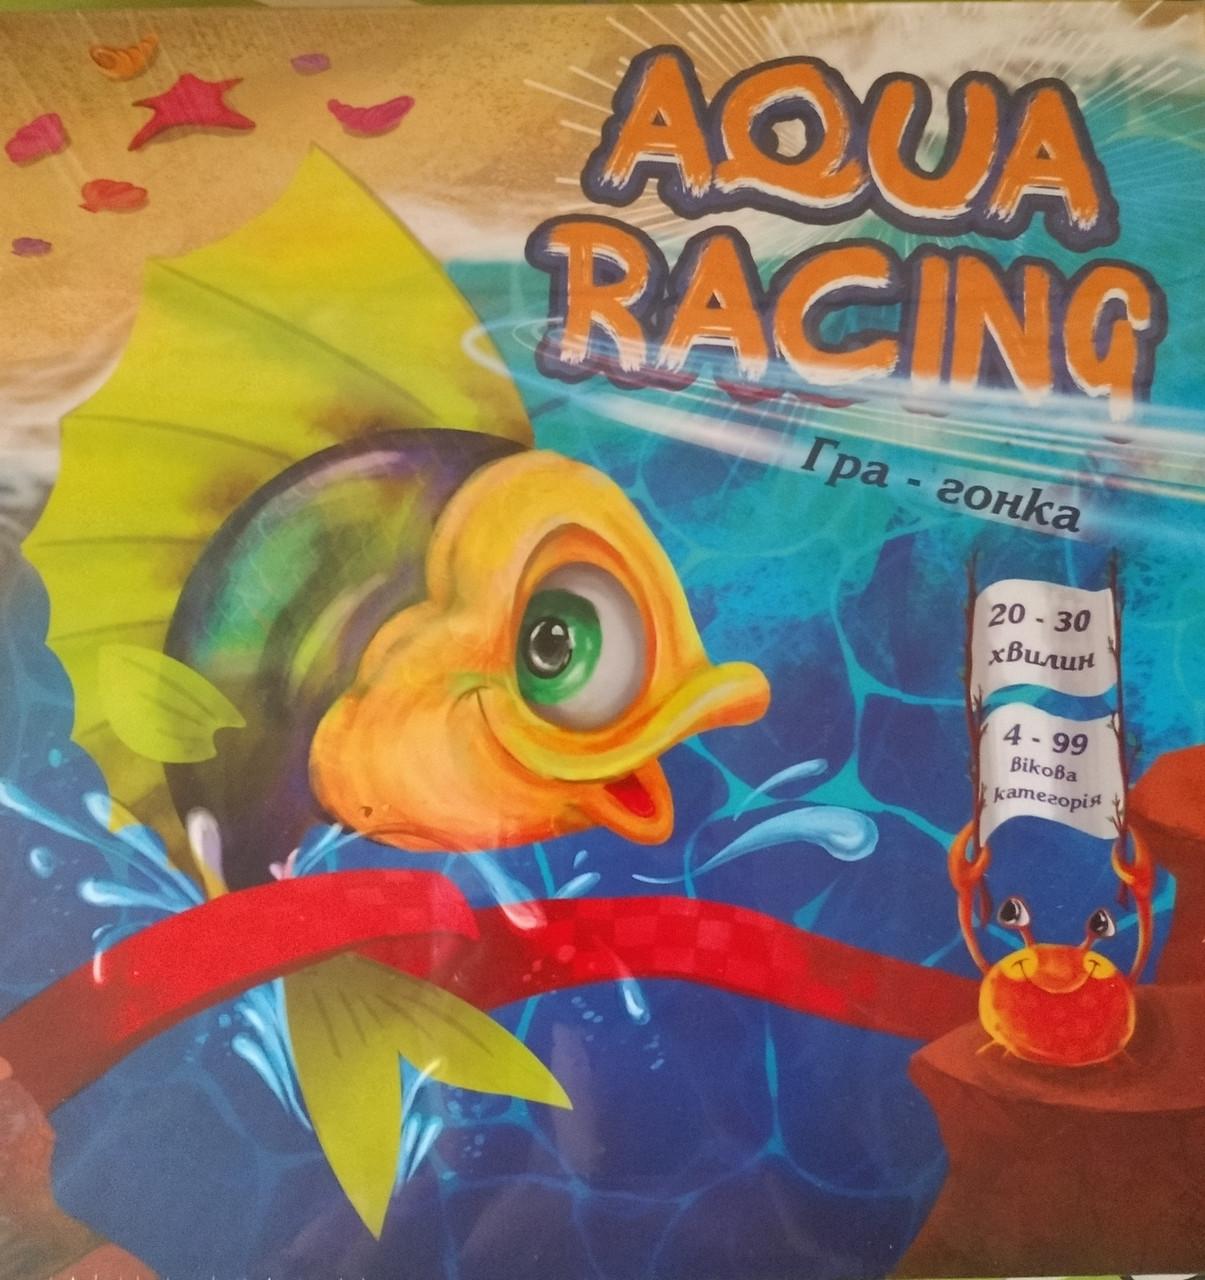 Настільна гра Стратег «Agua racing», 30416